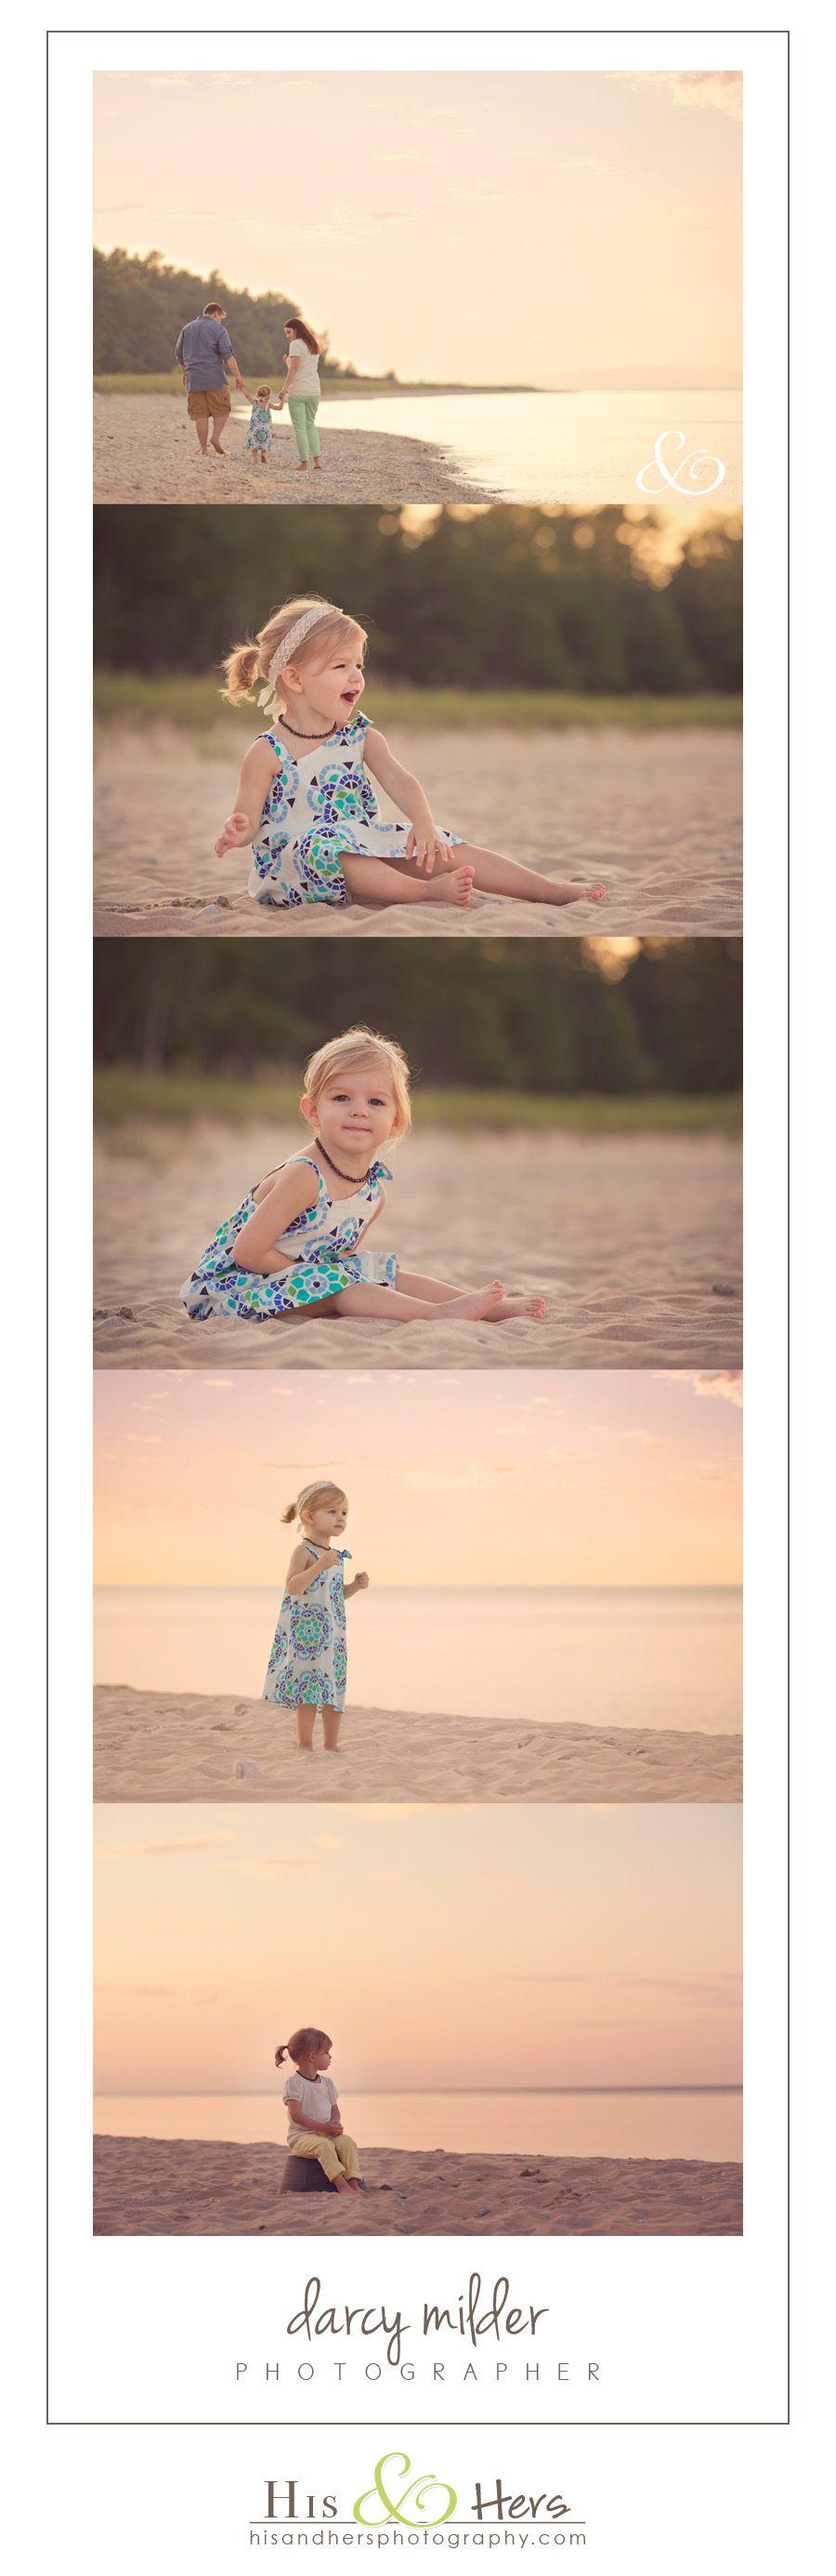 iowa child childlren's photographer 2 year old pictures